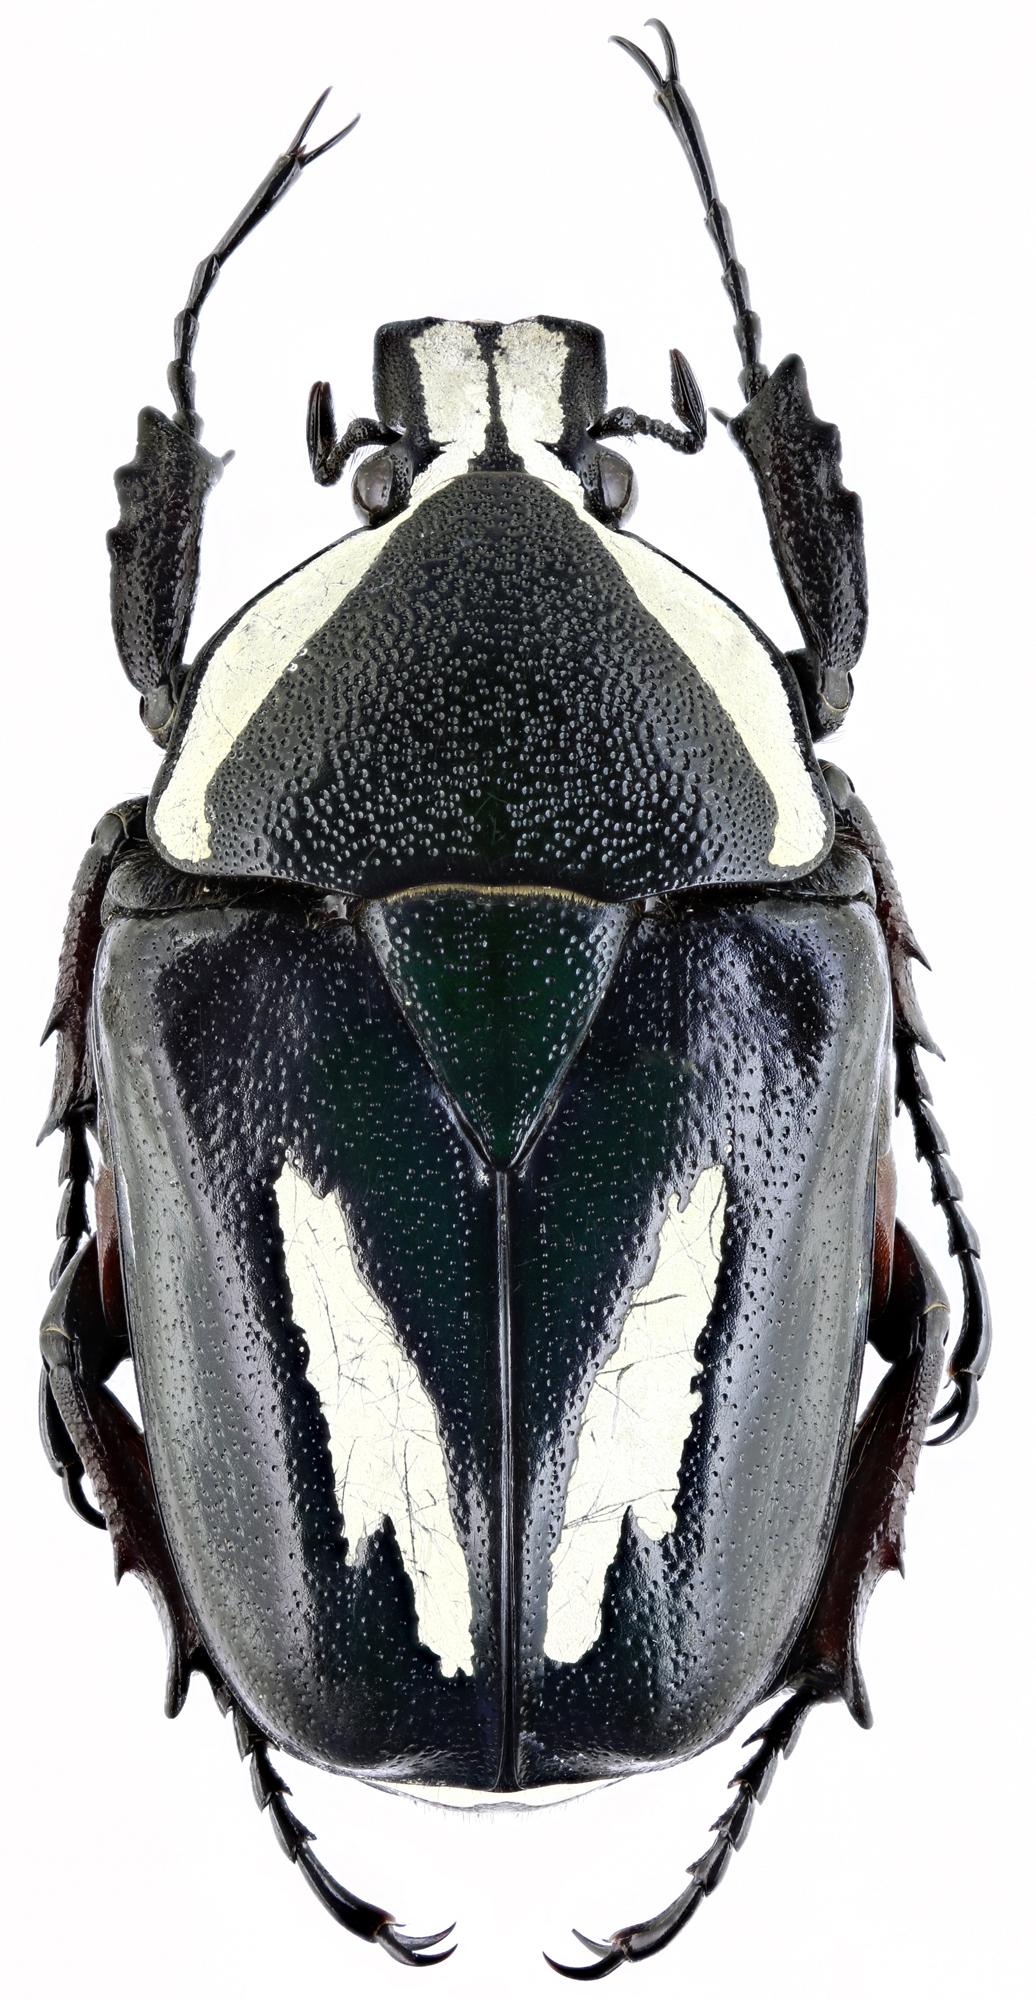 Dicronorhina derbyana carnifex 15830zs40.jpg